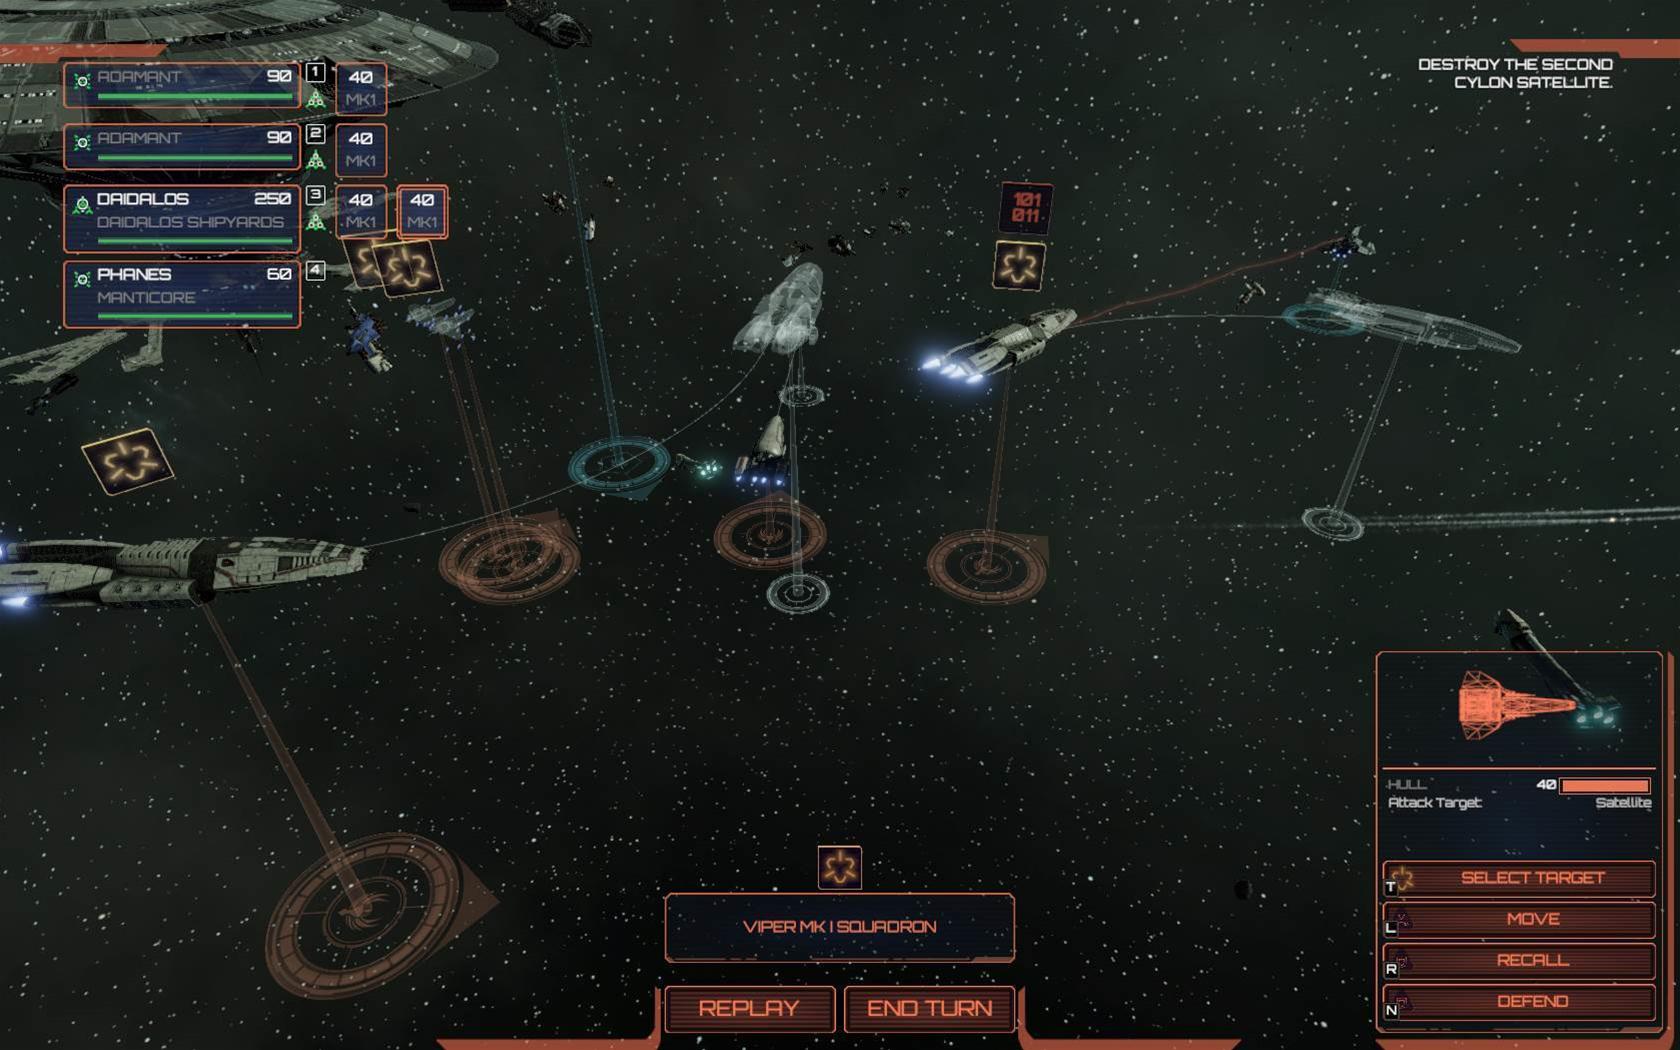 Battlestar Galactica: Deadlock is out this month!